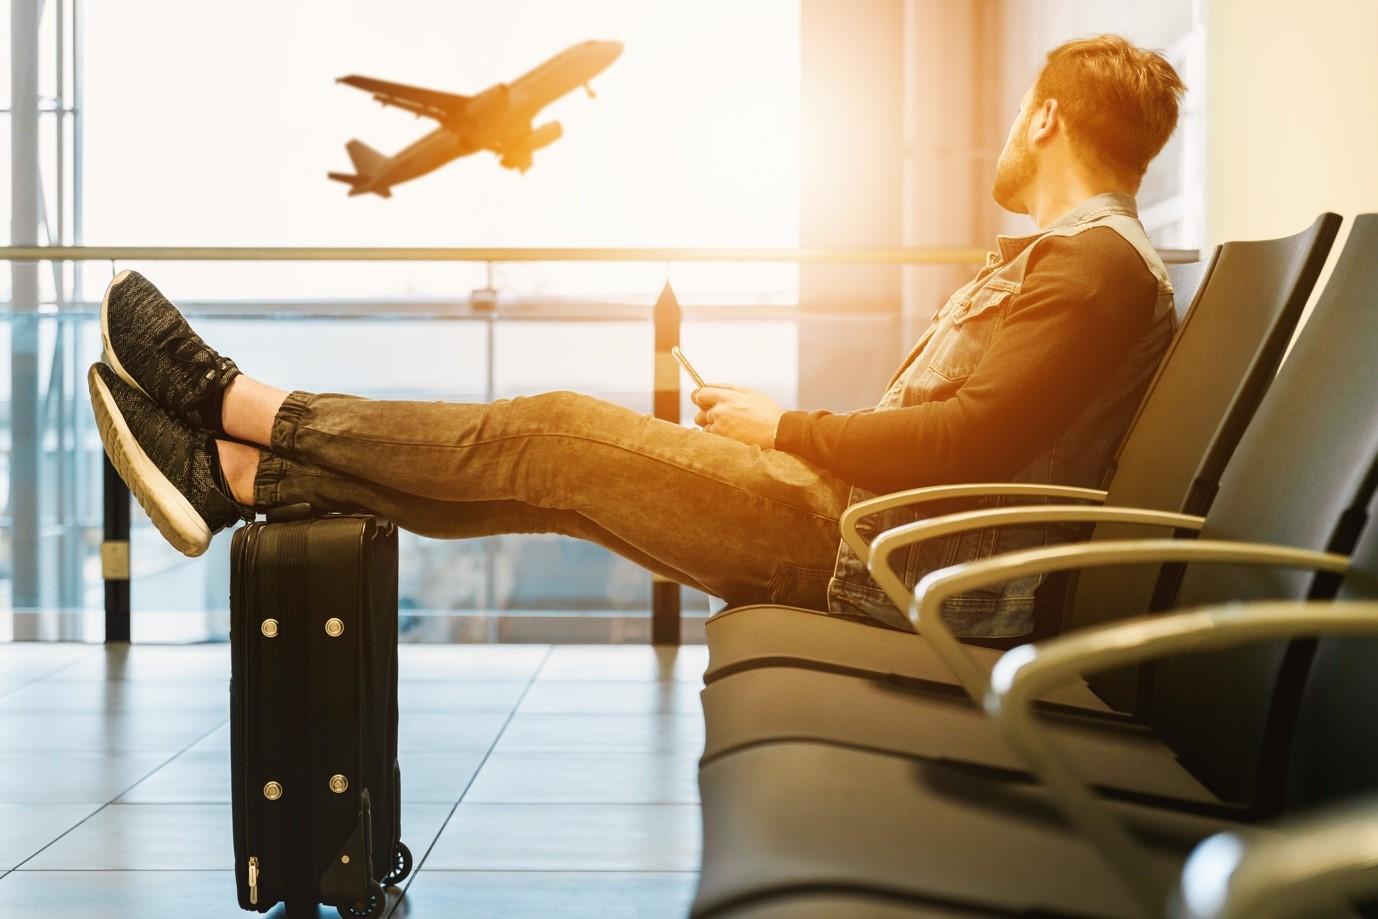 Man sat down looking at an aeroplane through a window